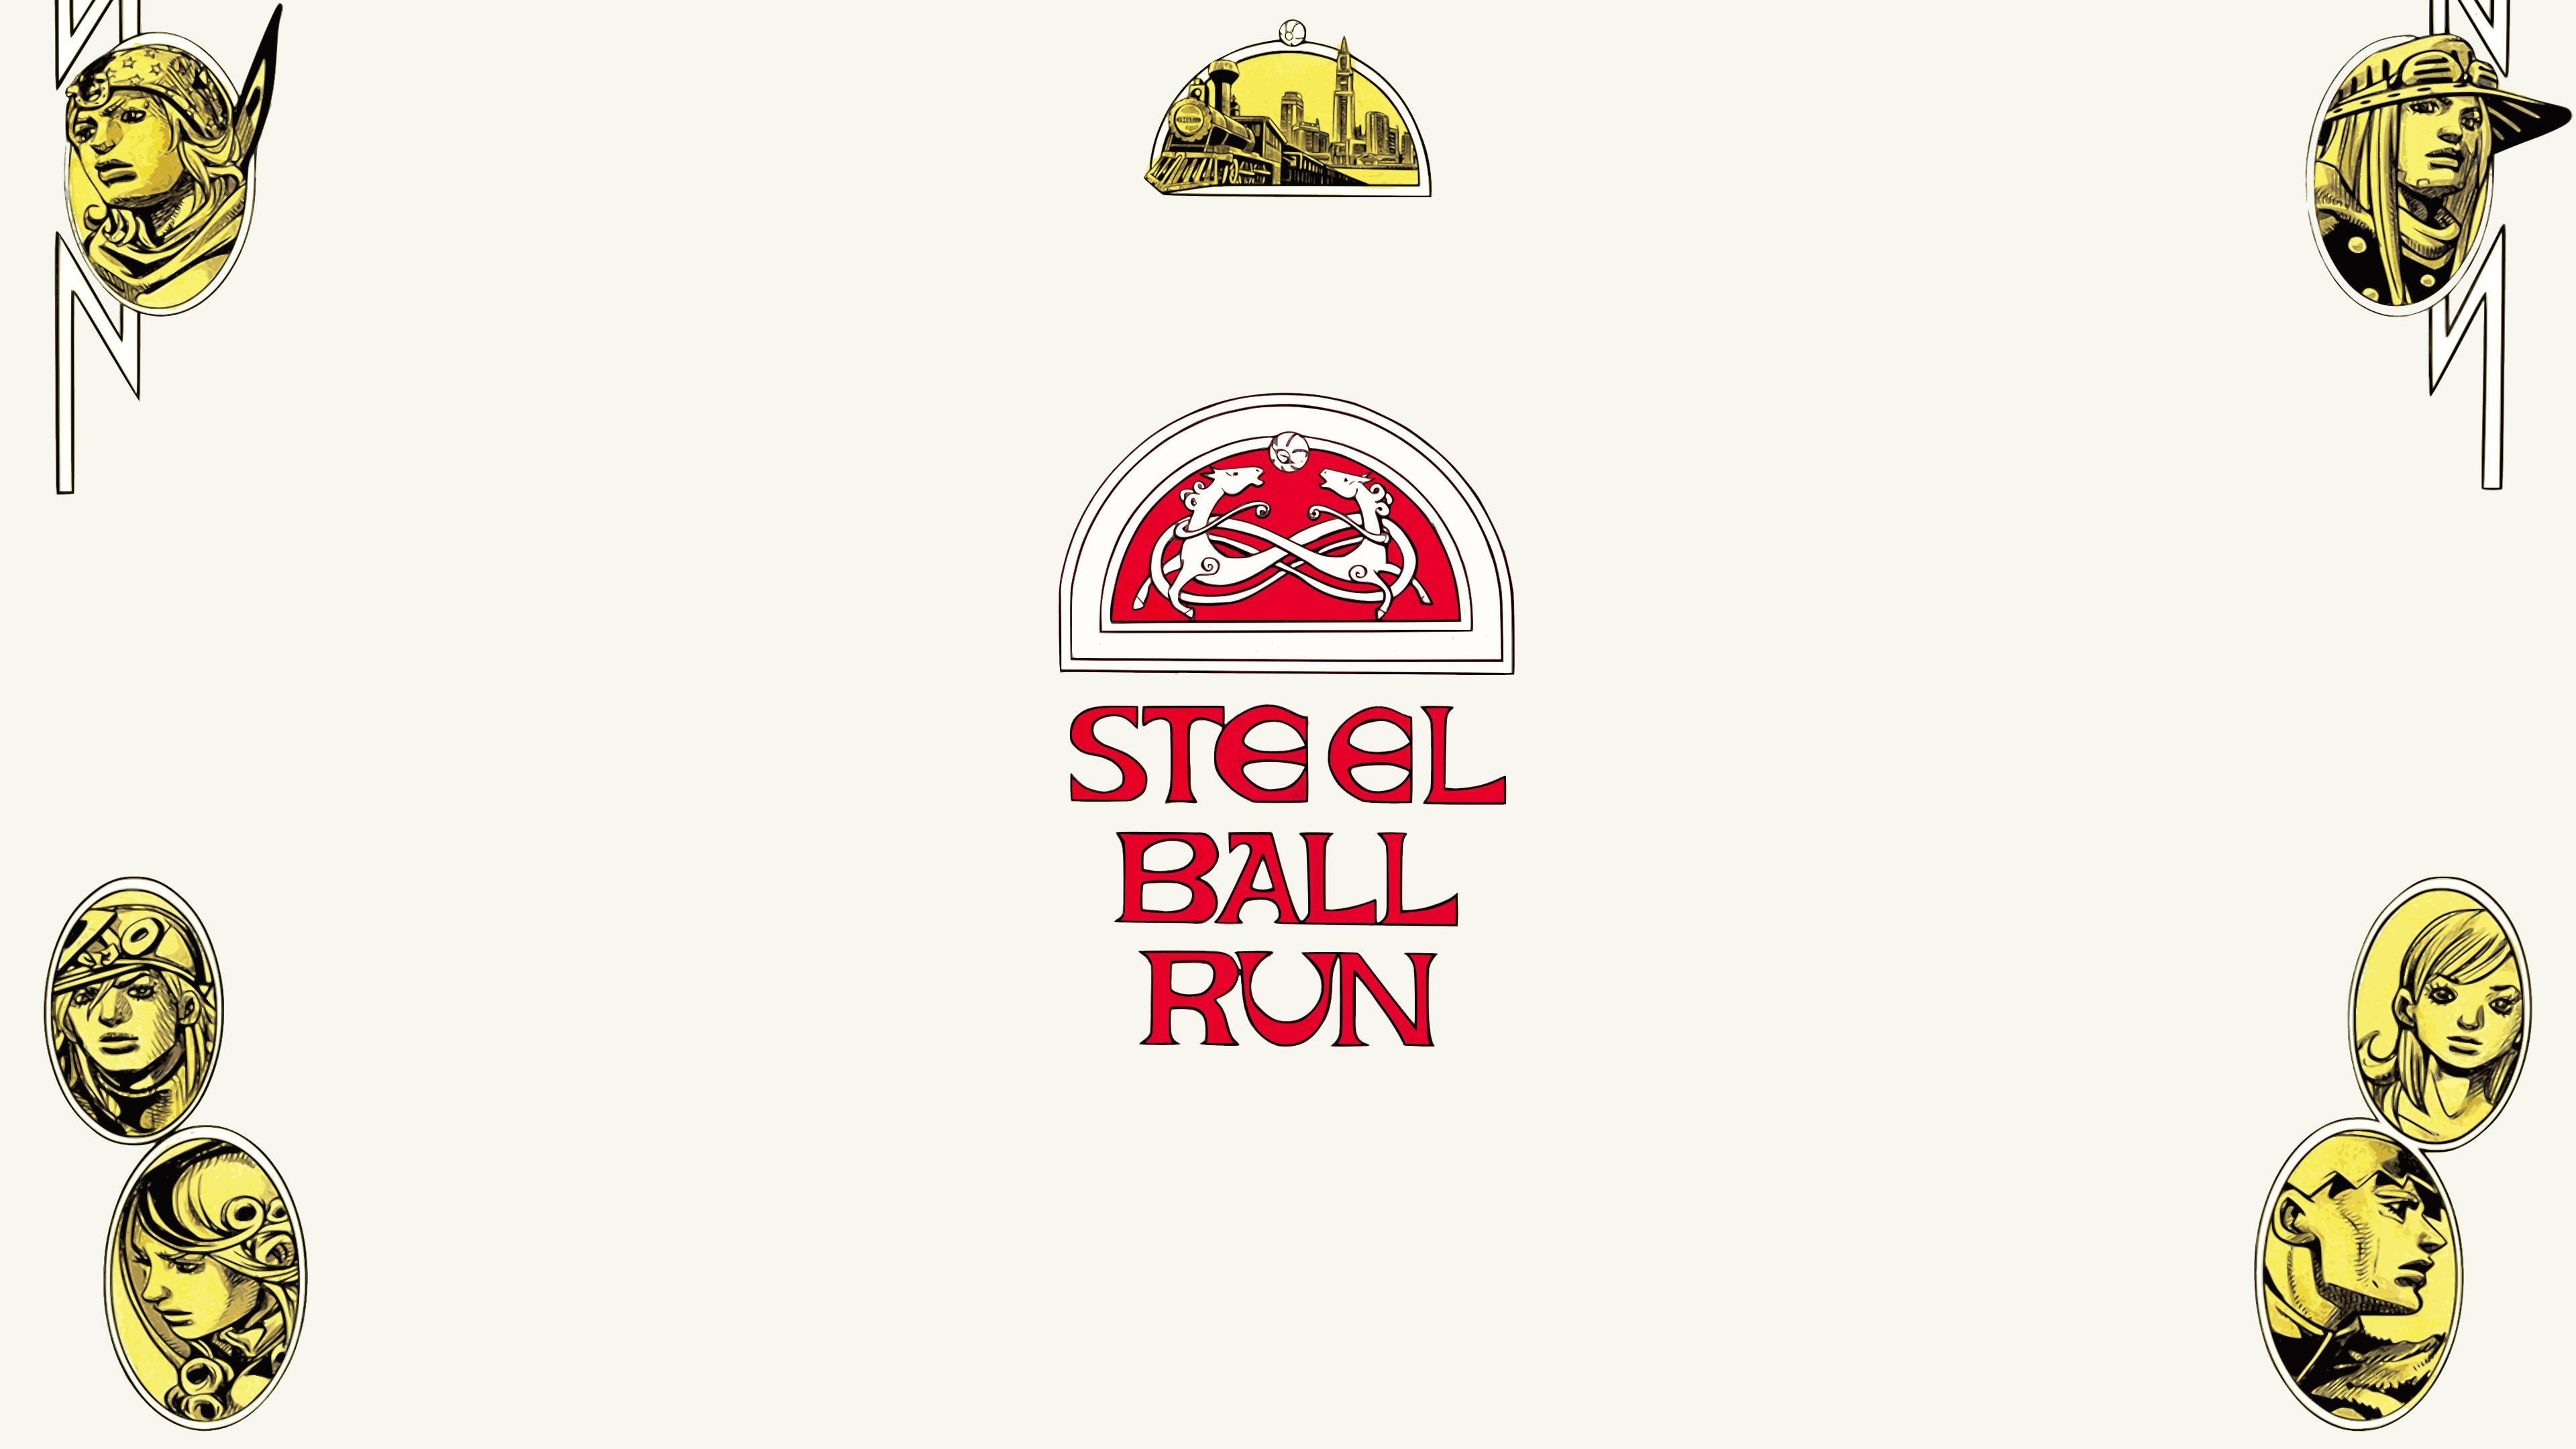 Steel Ball Run Wallpapers Top Free Steel Ball Run Backgrounds